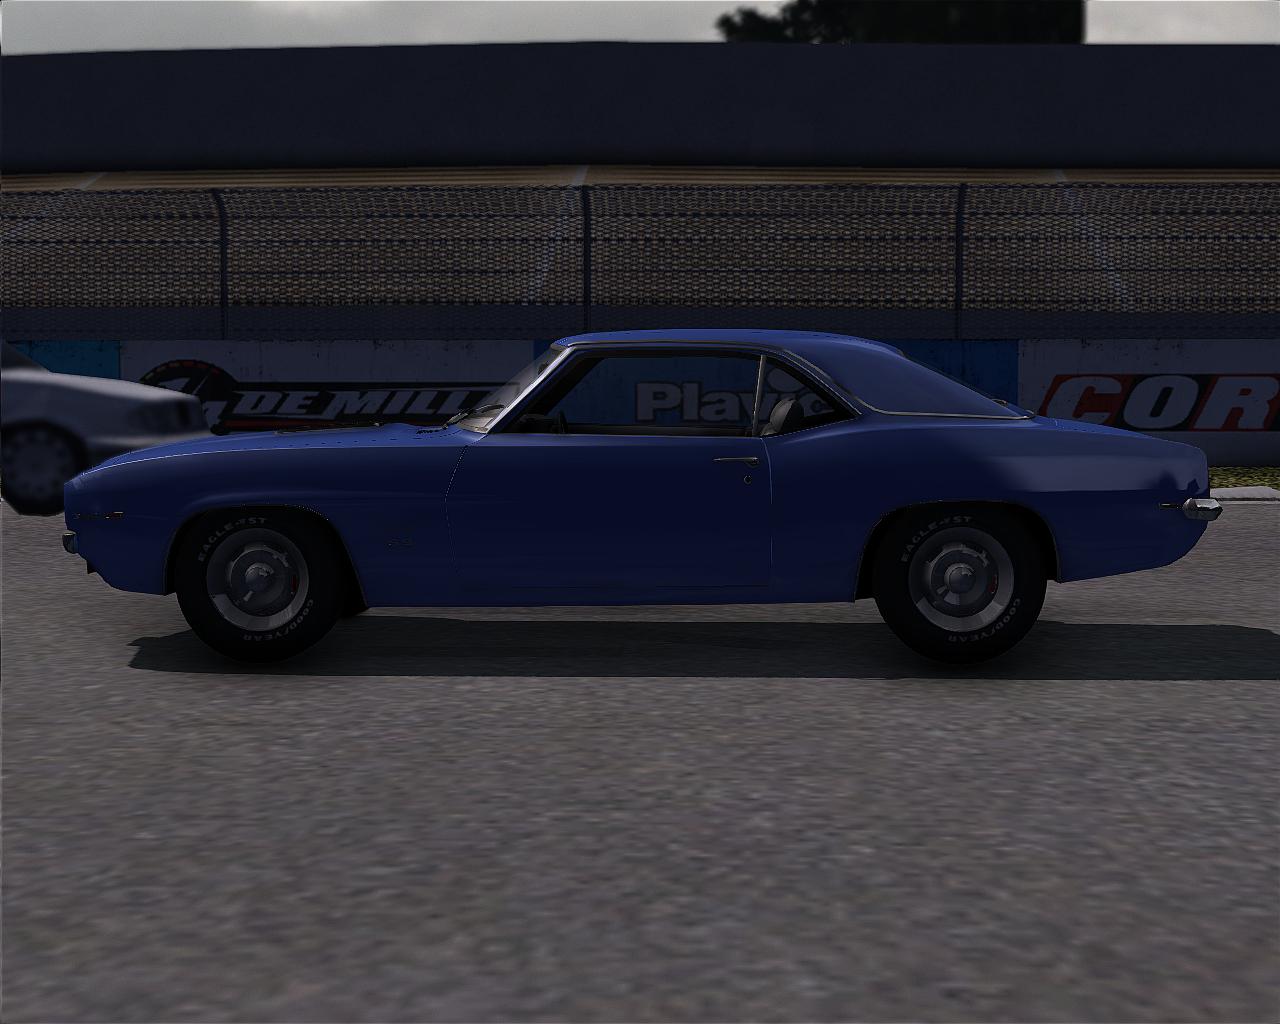 1969 Chevy Camaro rims